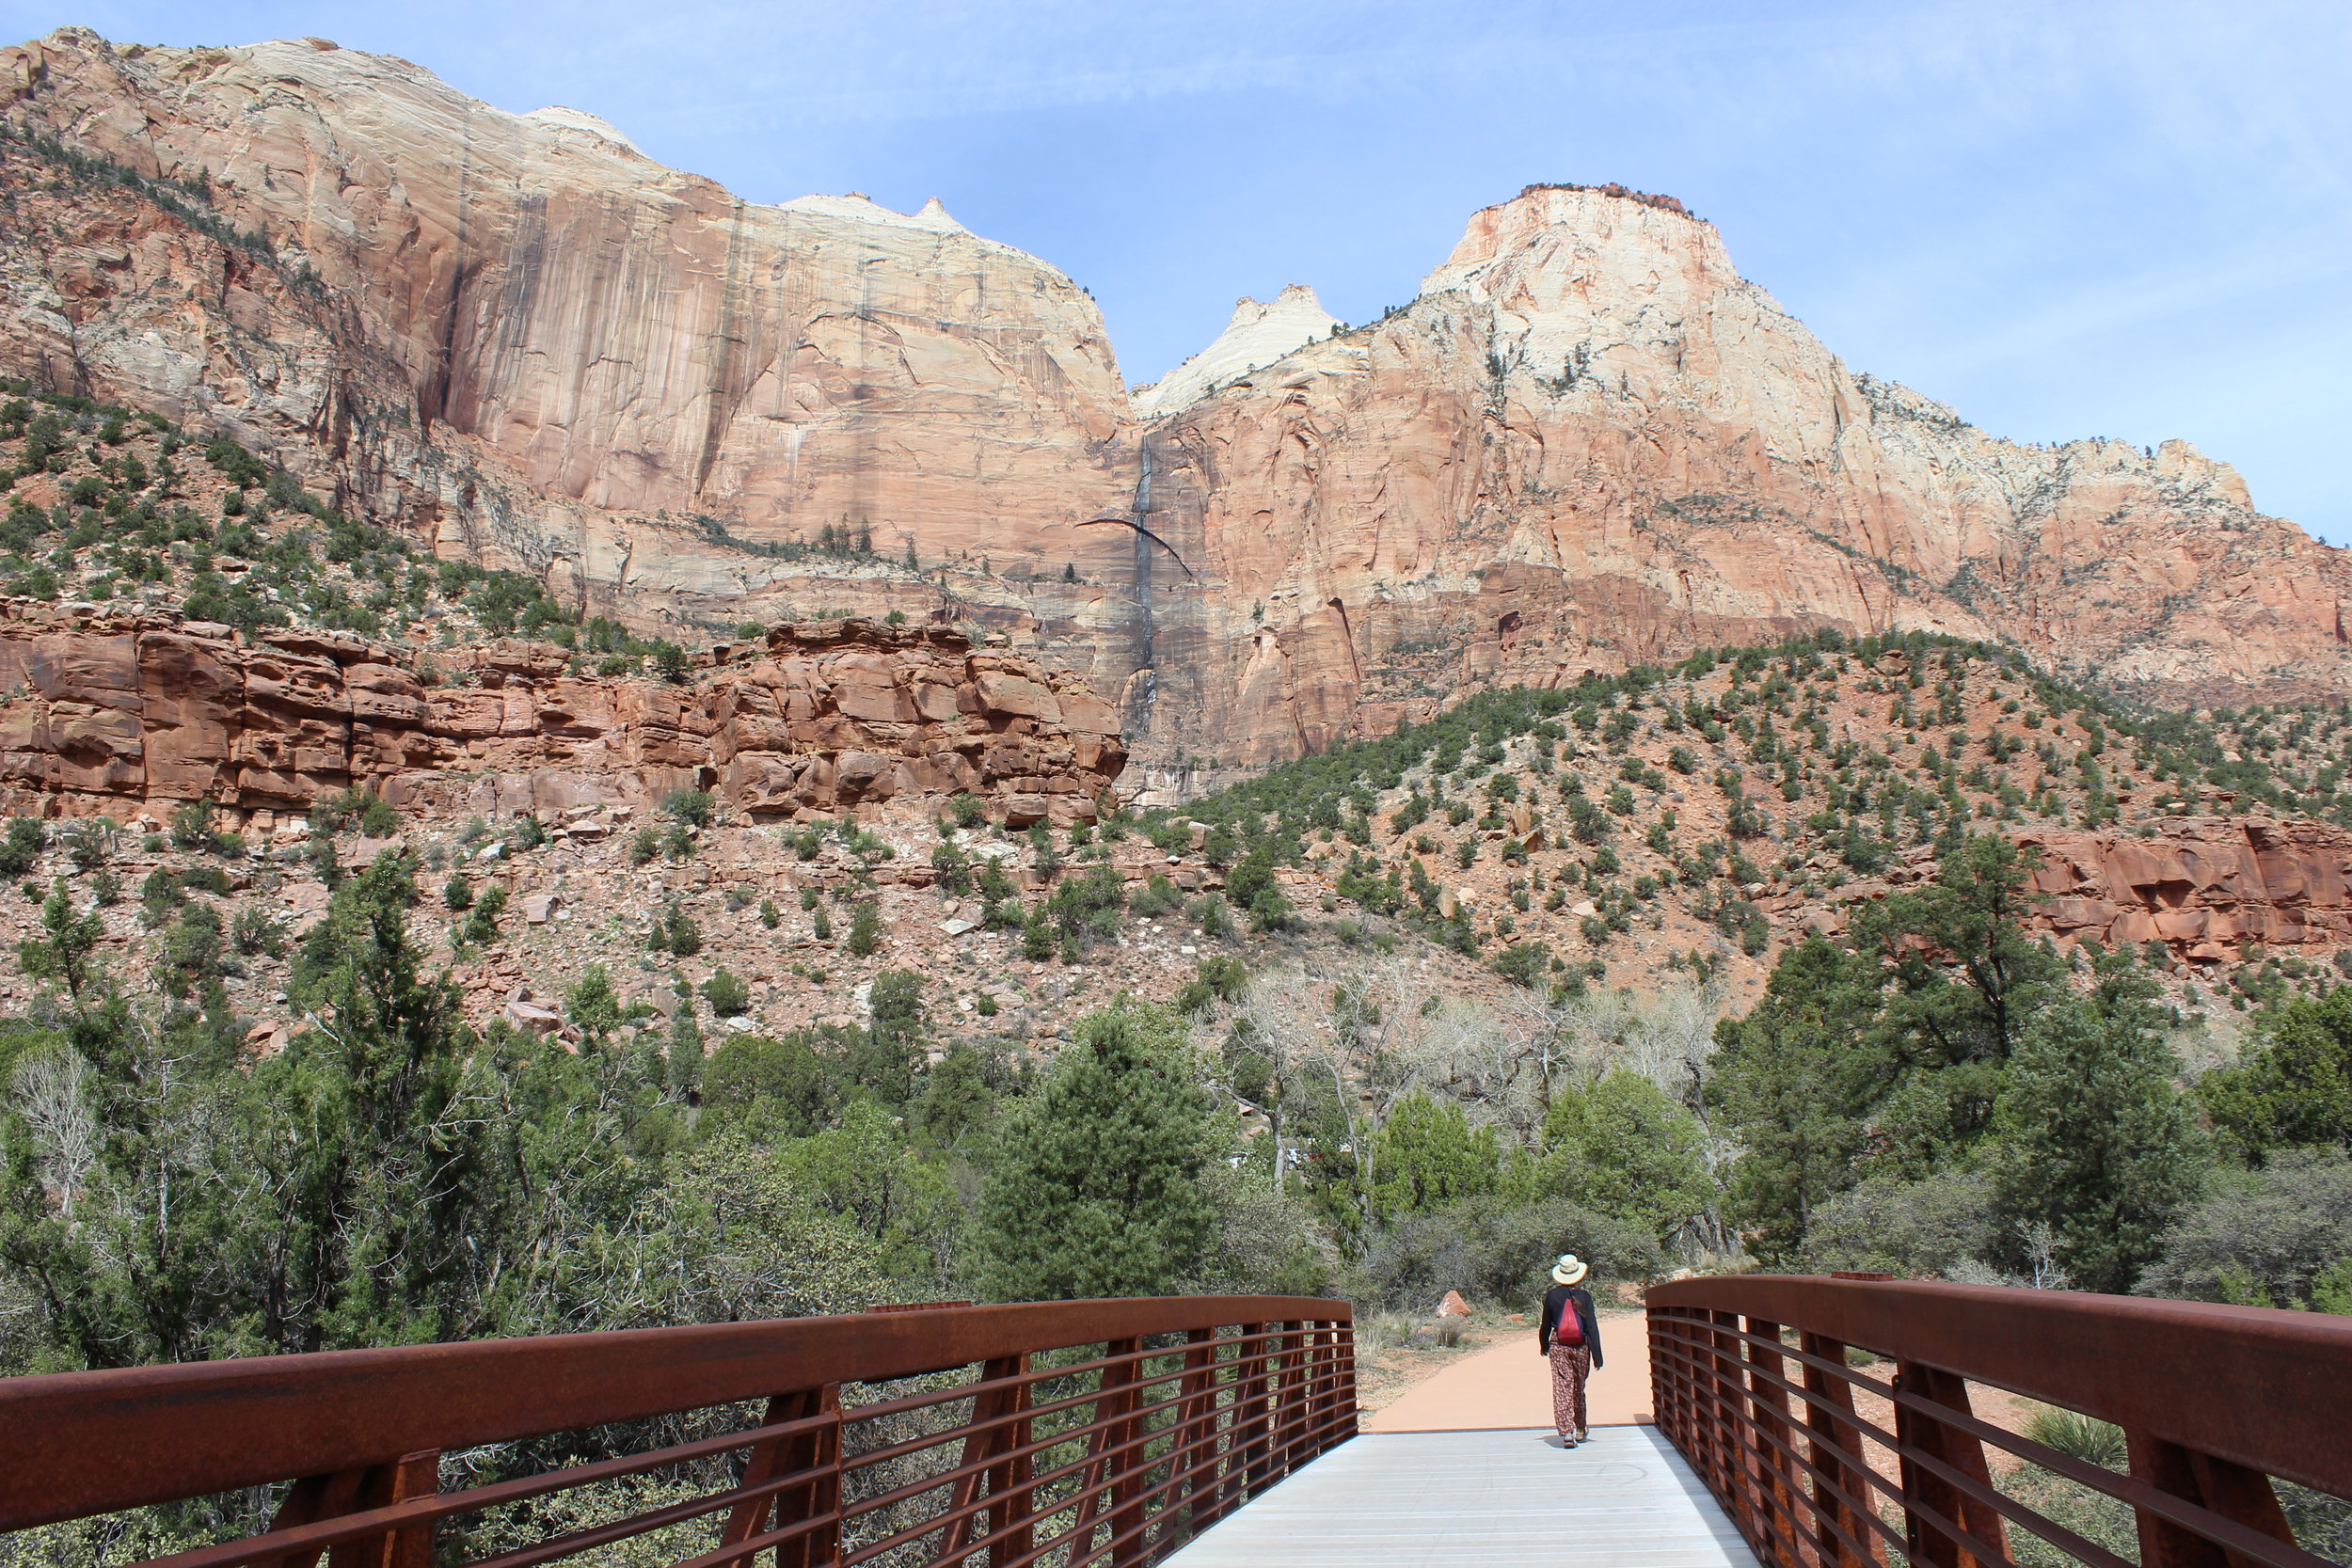 Women walks along the Pa'rus trail